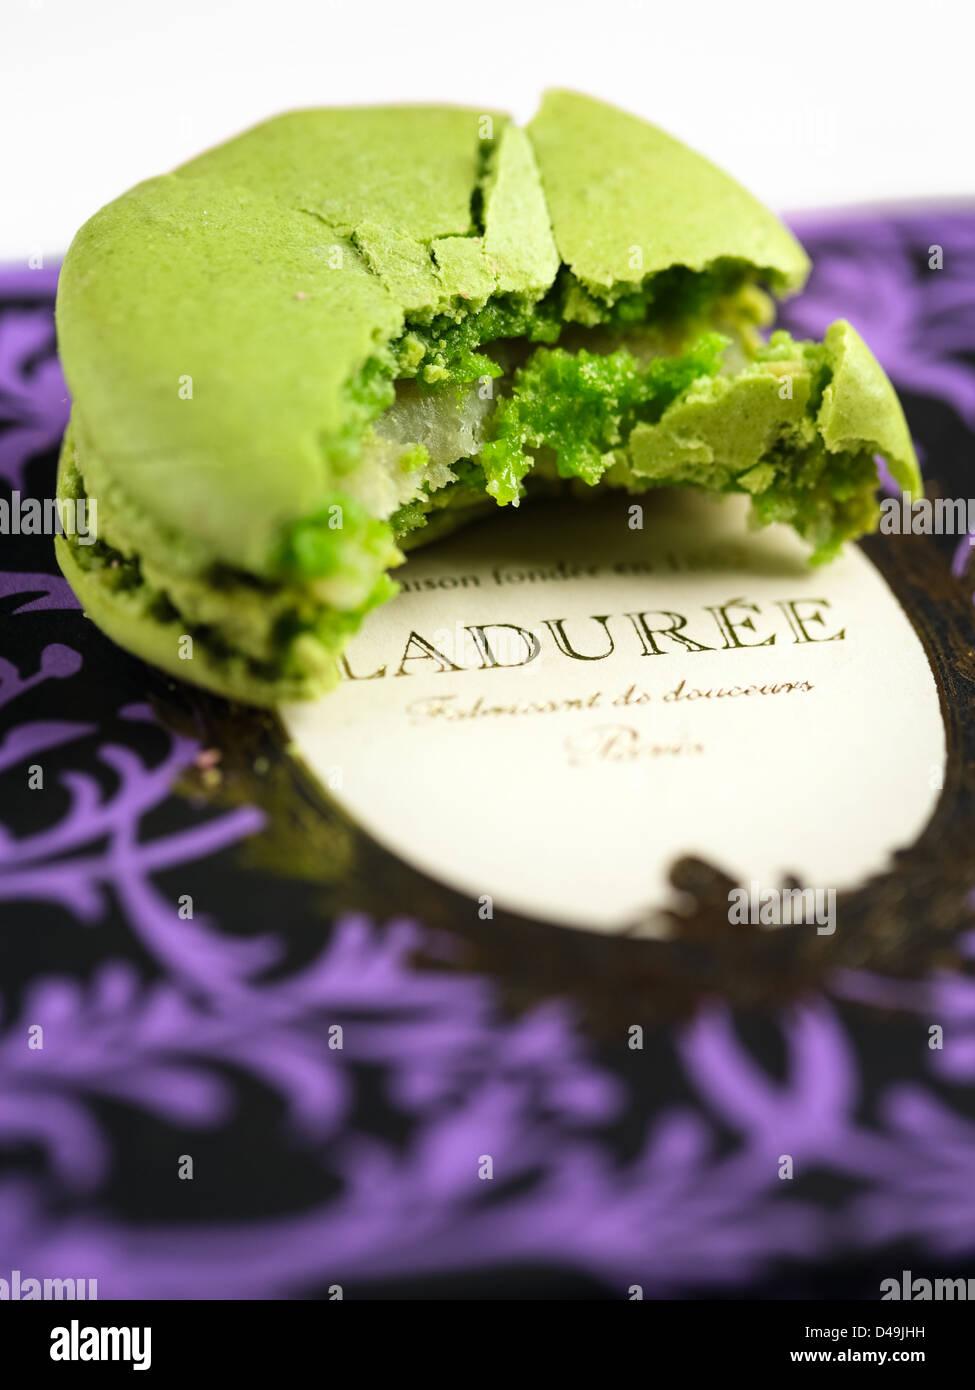 One Macaron on Box Laduree - Stock Image